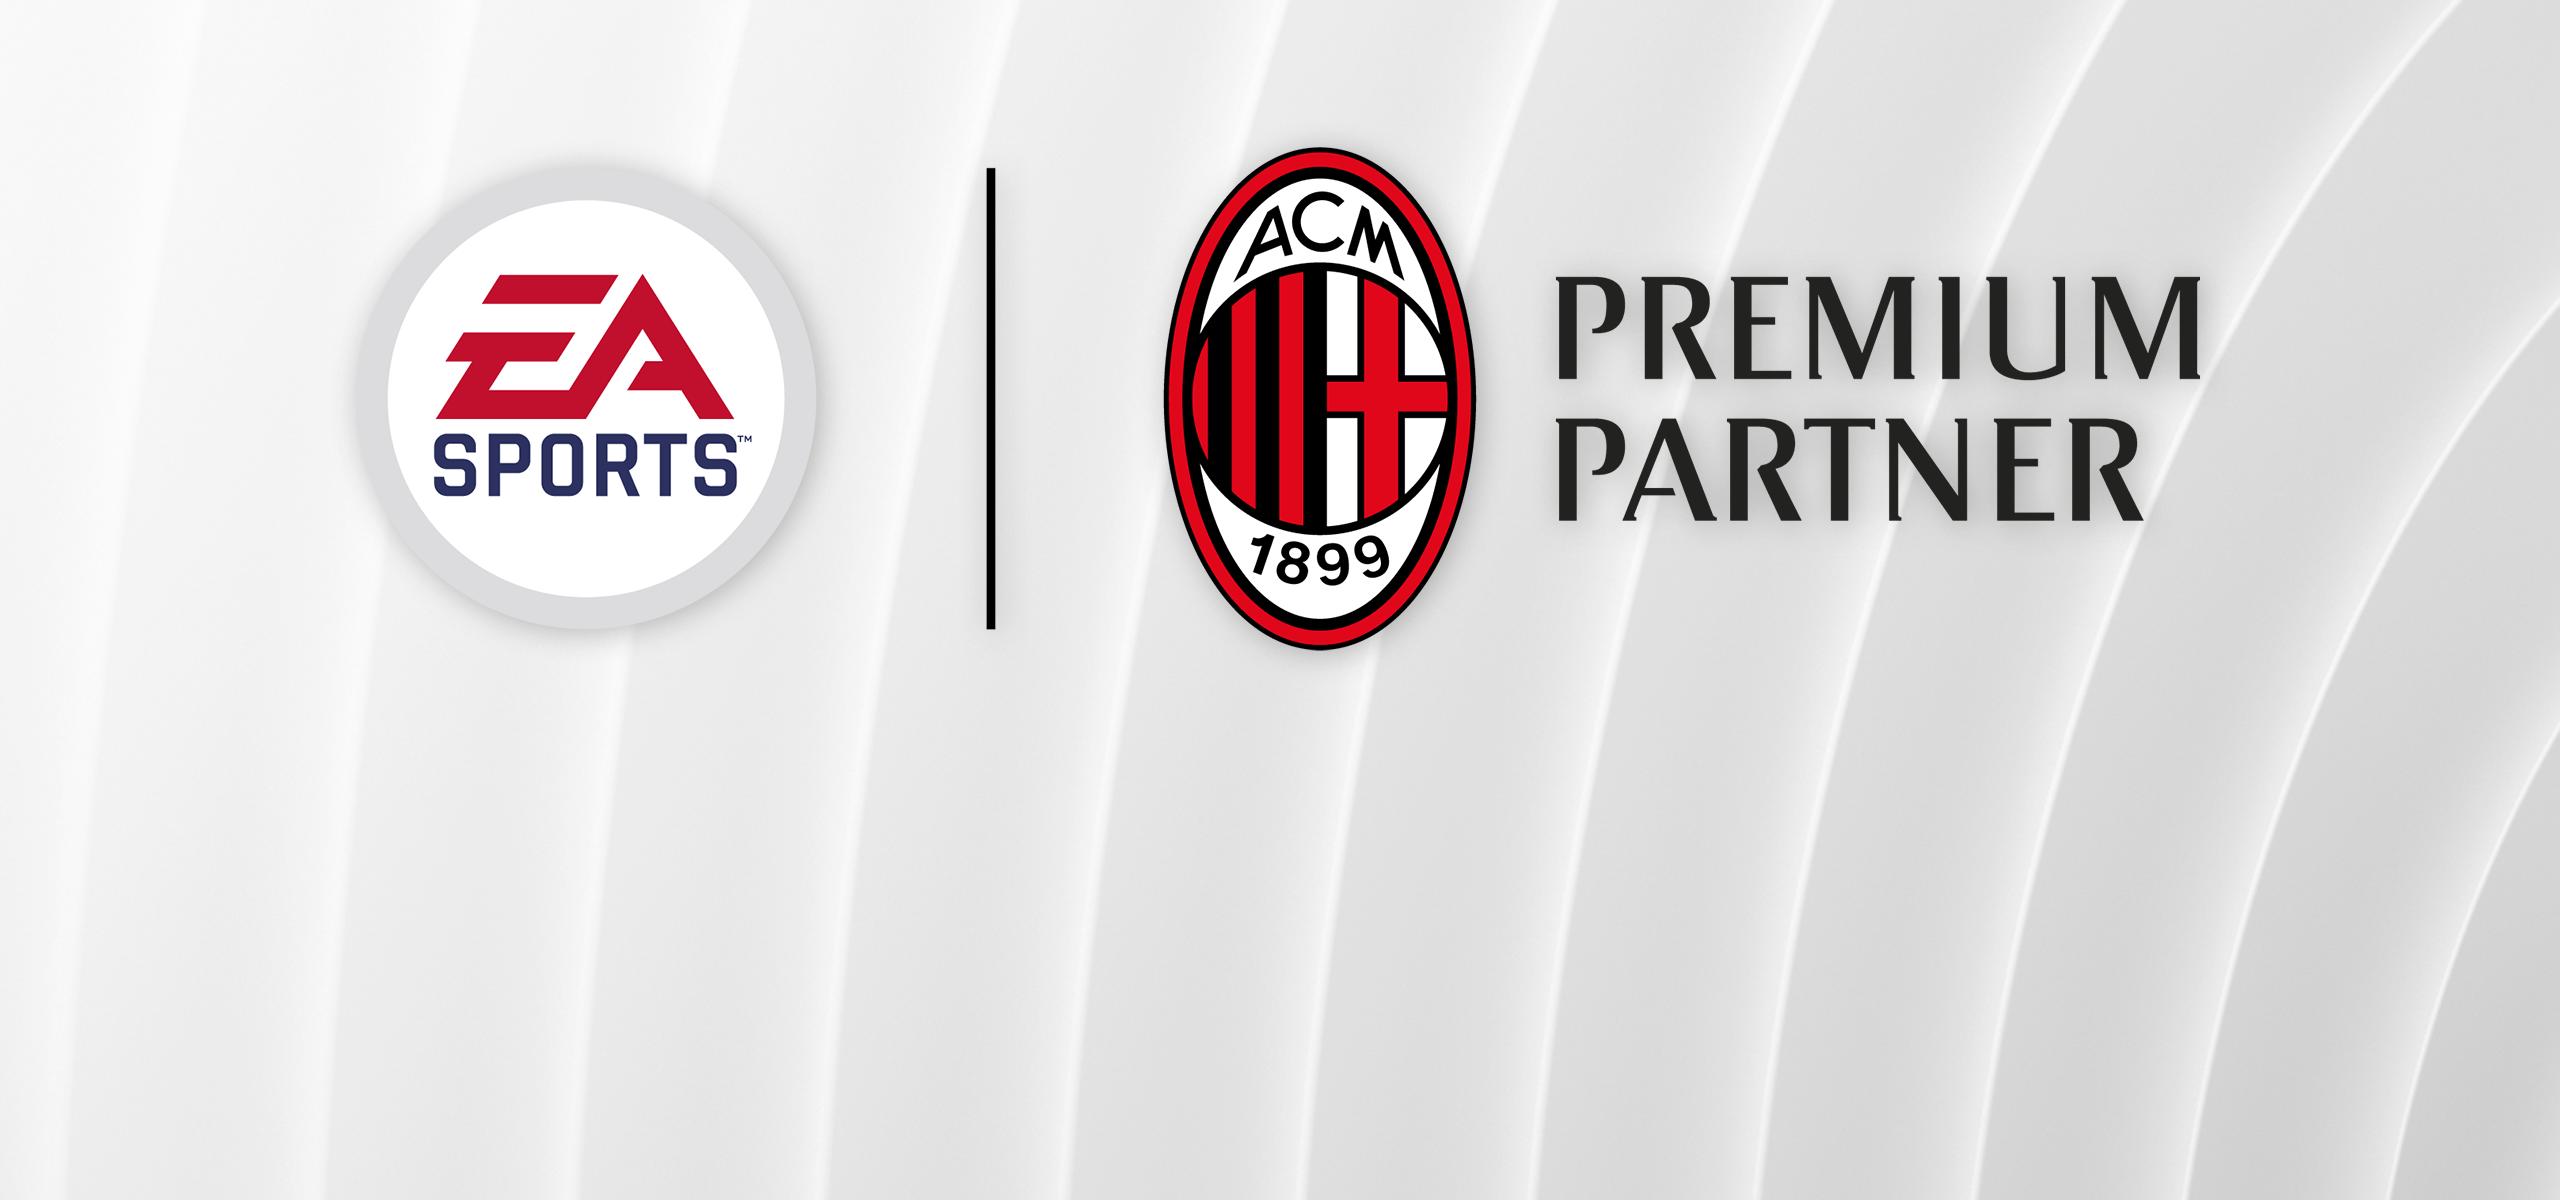 AC Milan an Electronic Arts announce exclusive premium partnership | AC Milan